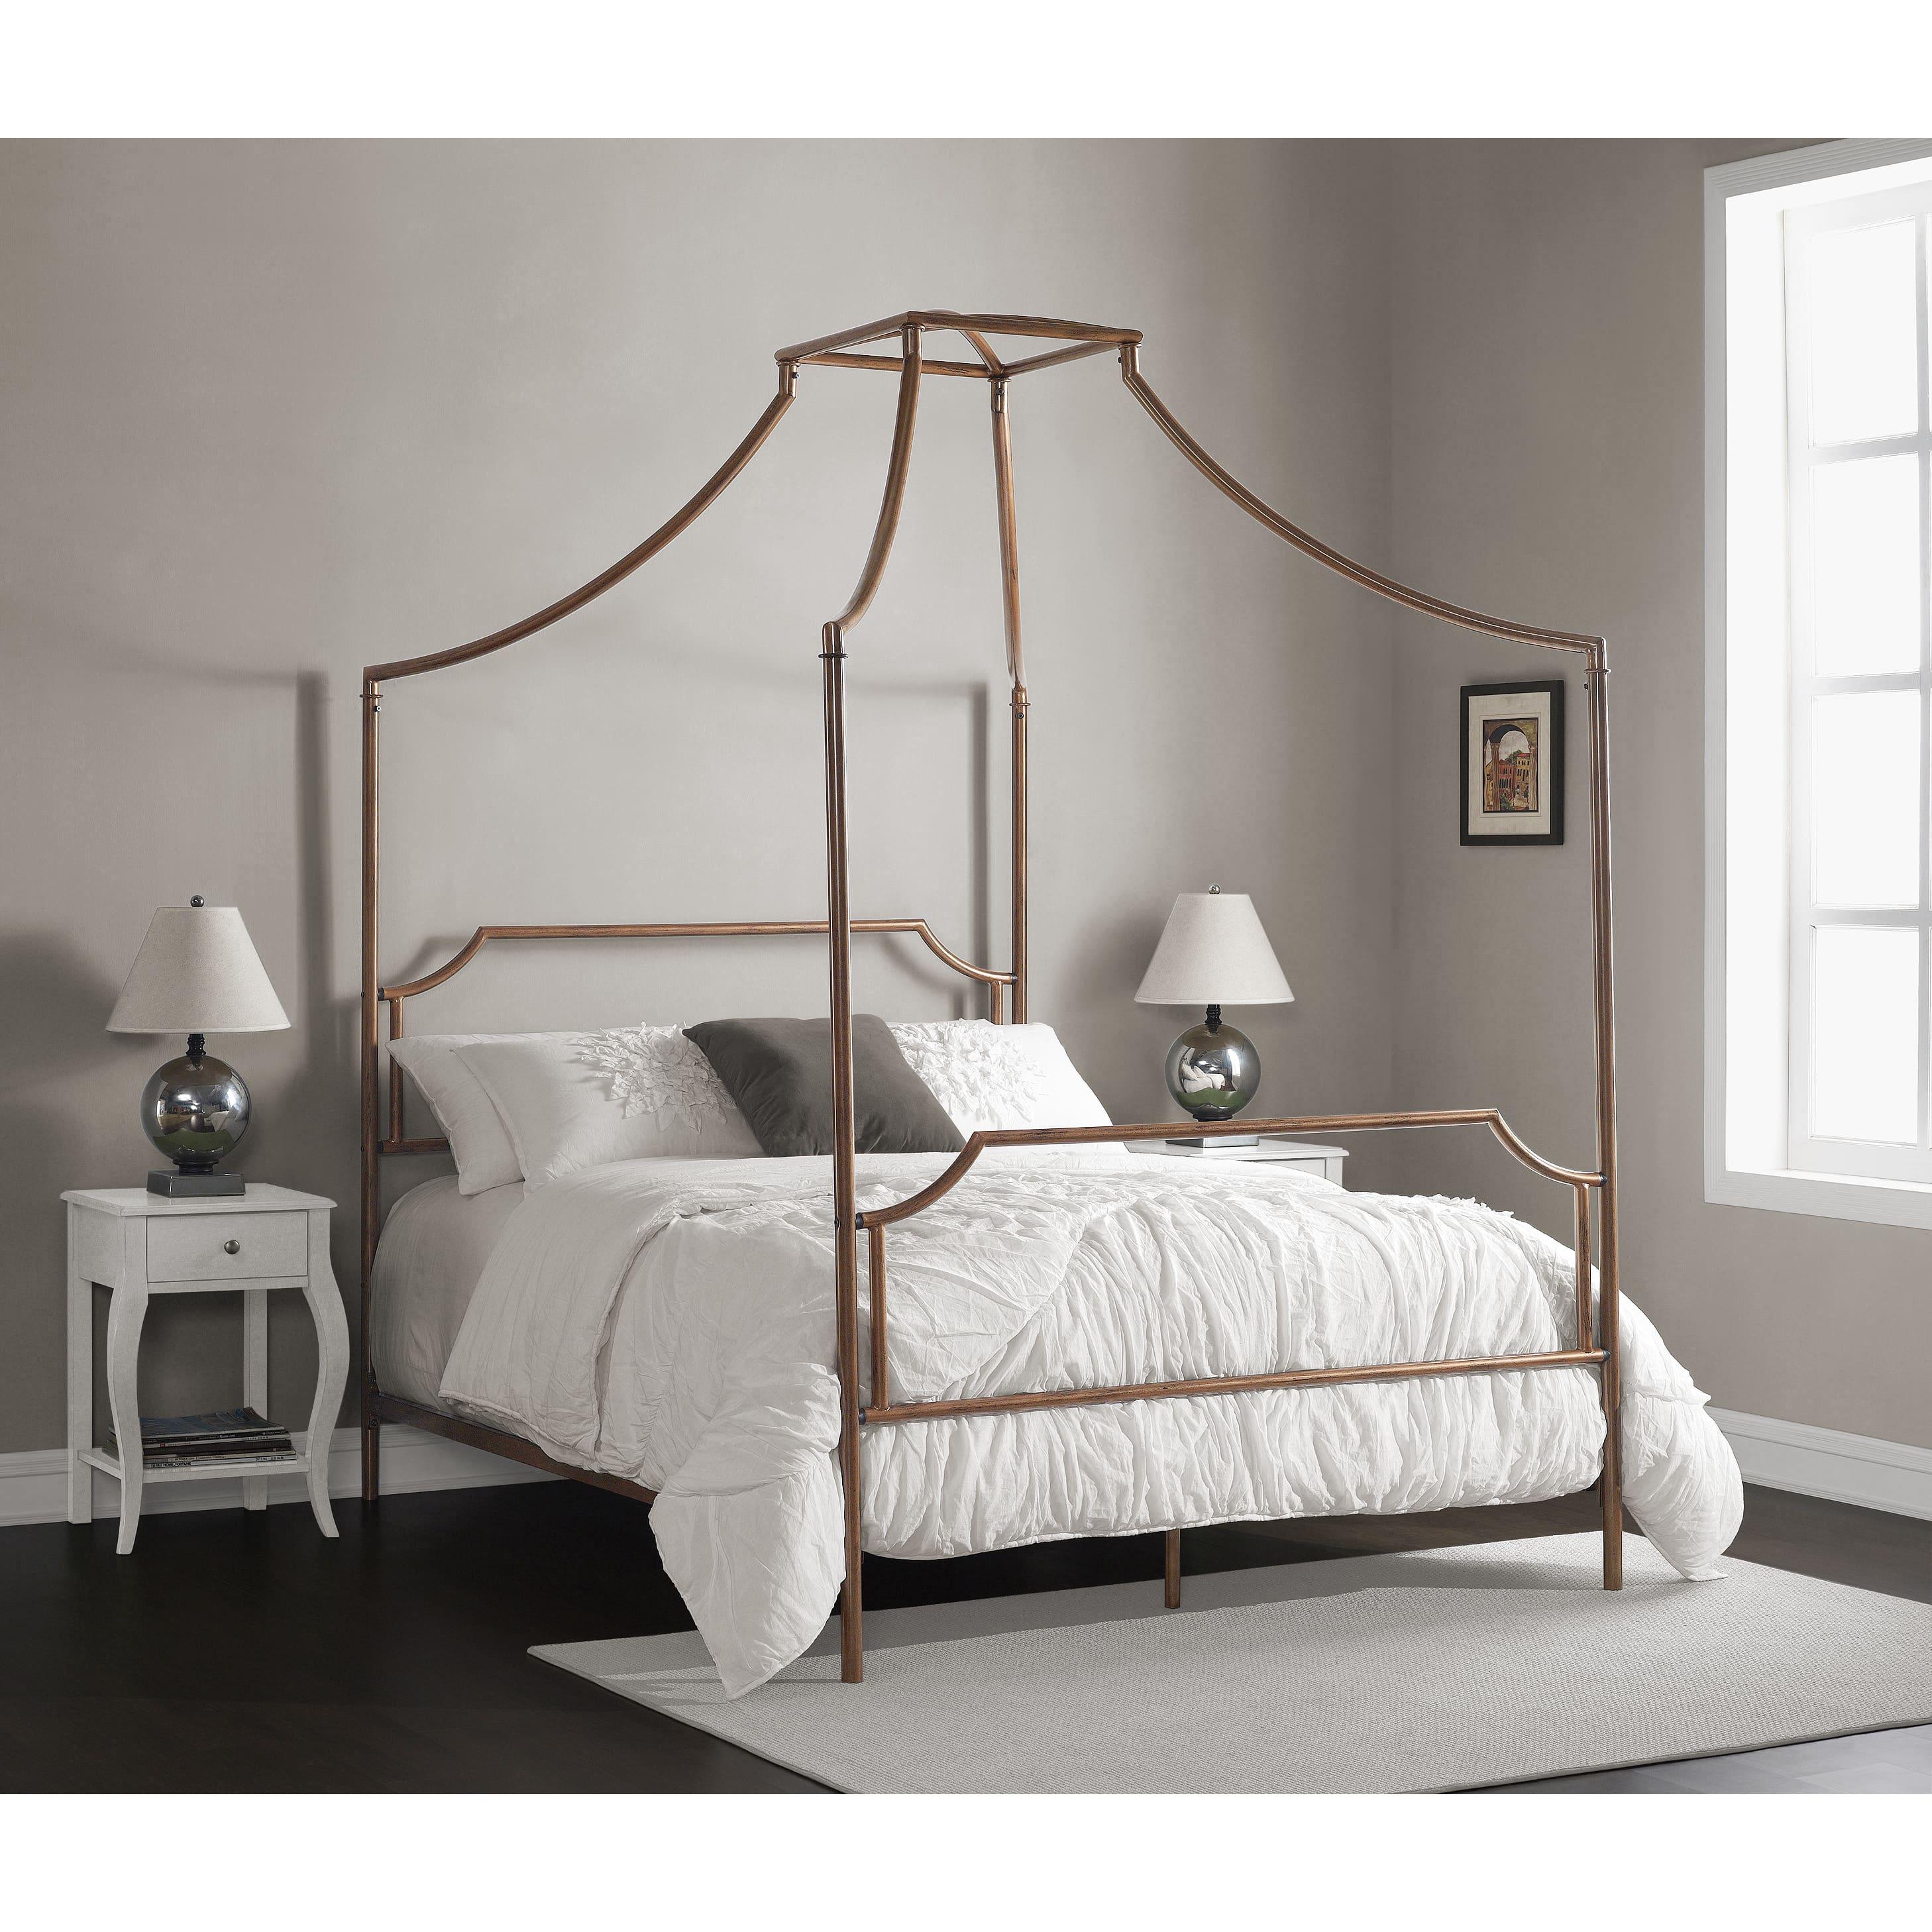 Find Great Furniture Deals